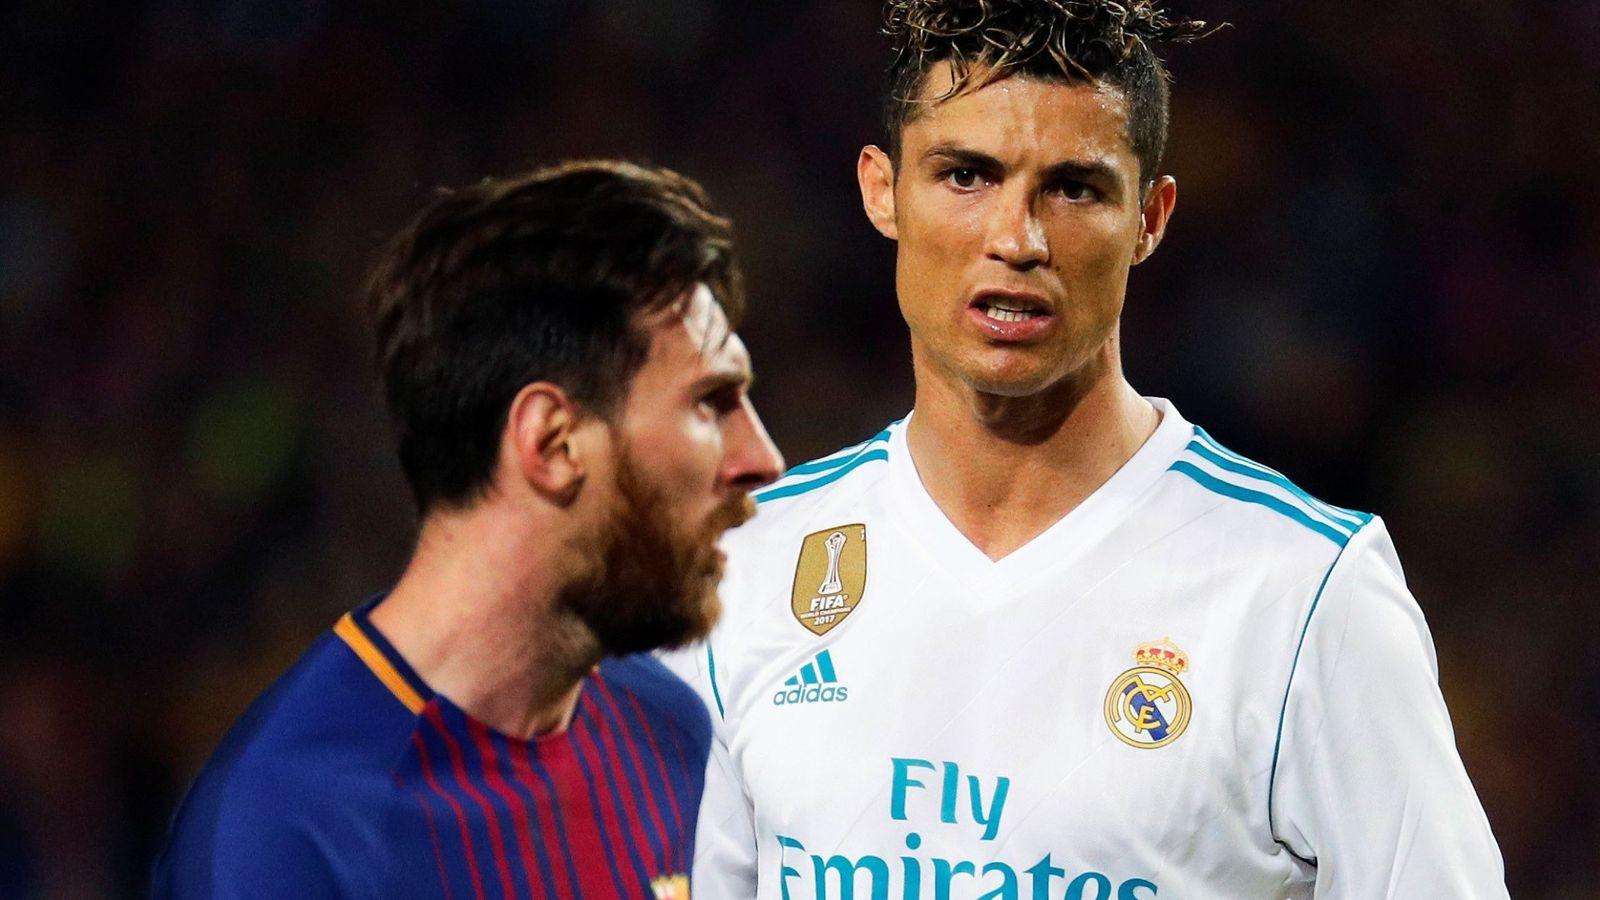 Foto: Cristiano Ronaldo aspira a ganar más que Messi. (EFE)